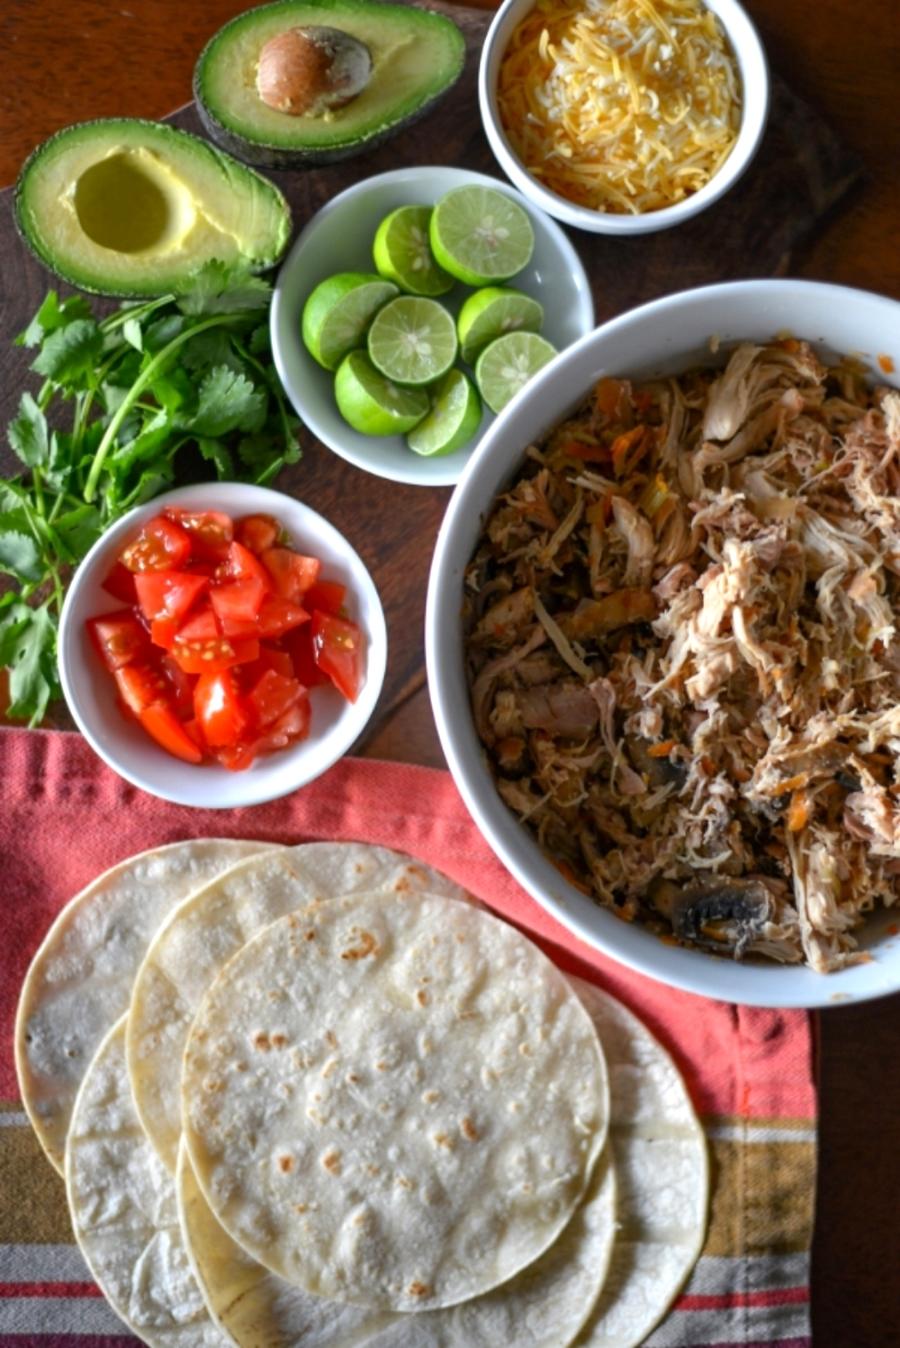 Shredded chicken taco ingredients